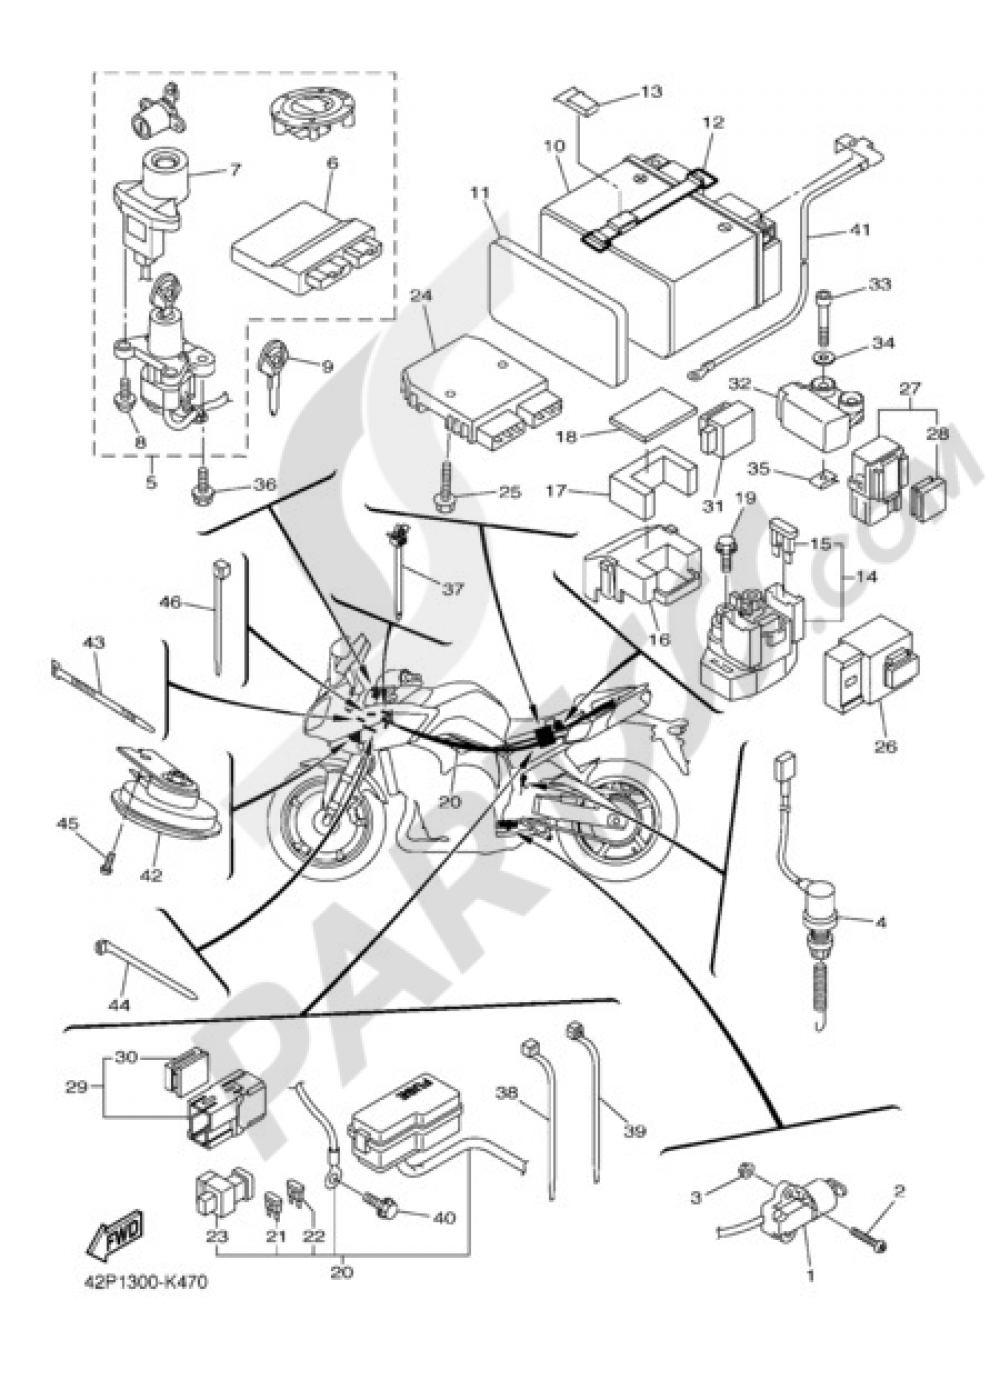 ELECTRIC EQUIPMENT 2 Yamaha Fazer8 2012